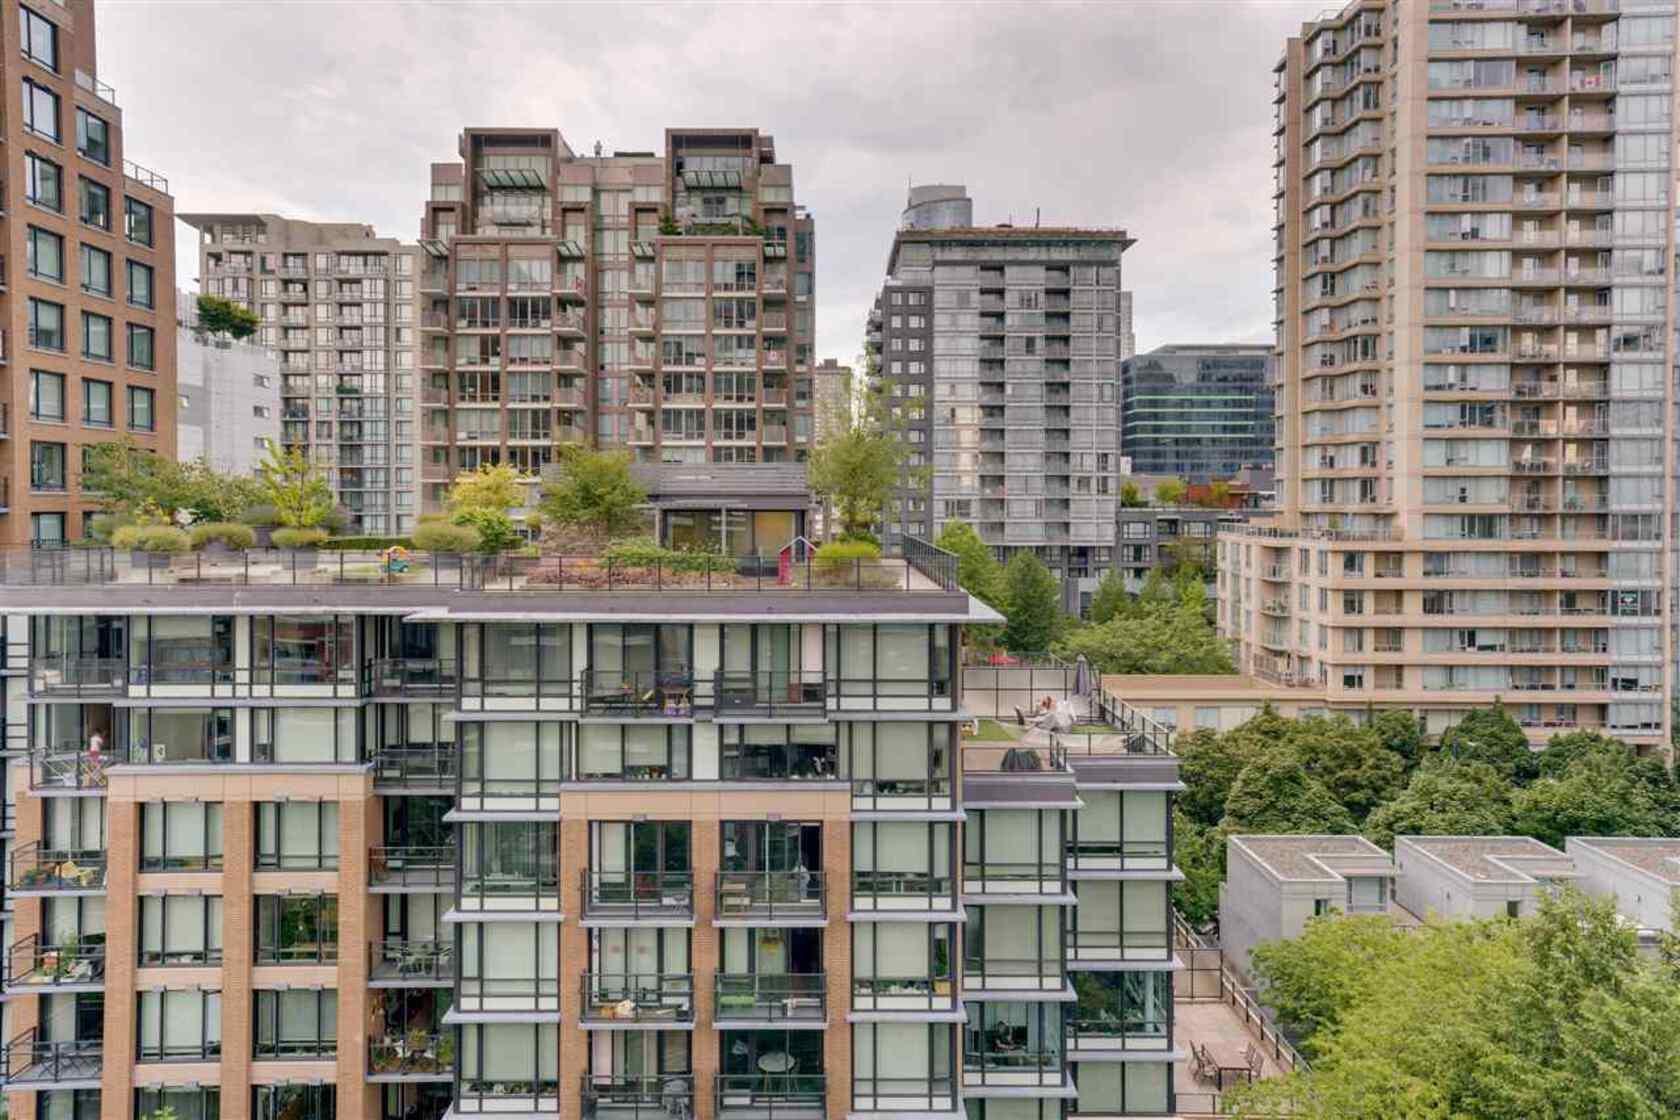 1055-homer-street-yaletown-vancouver-west-09 at 1105 - 1055 Homer Street, Yaletown, Vancouver West